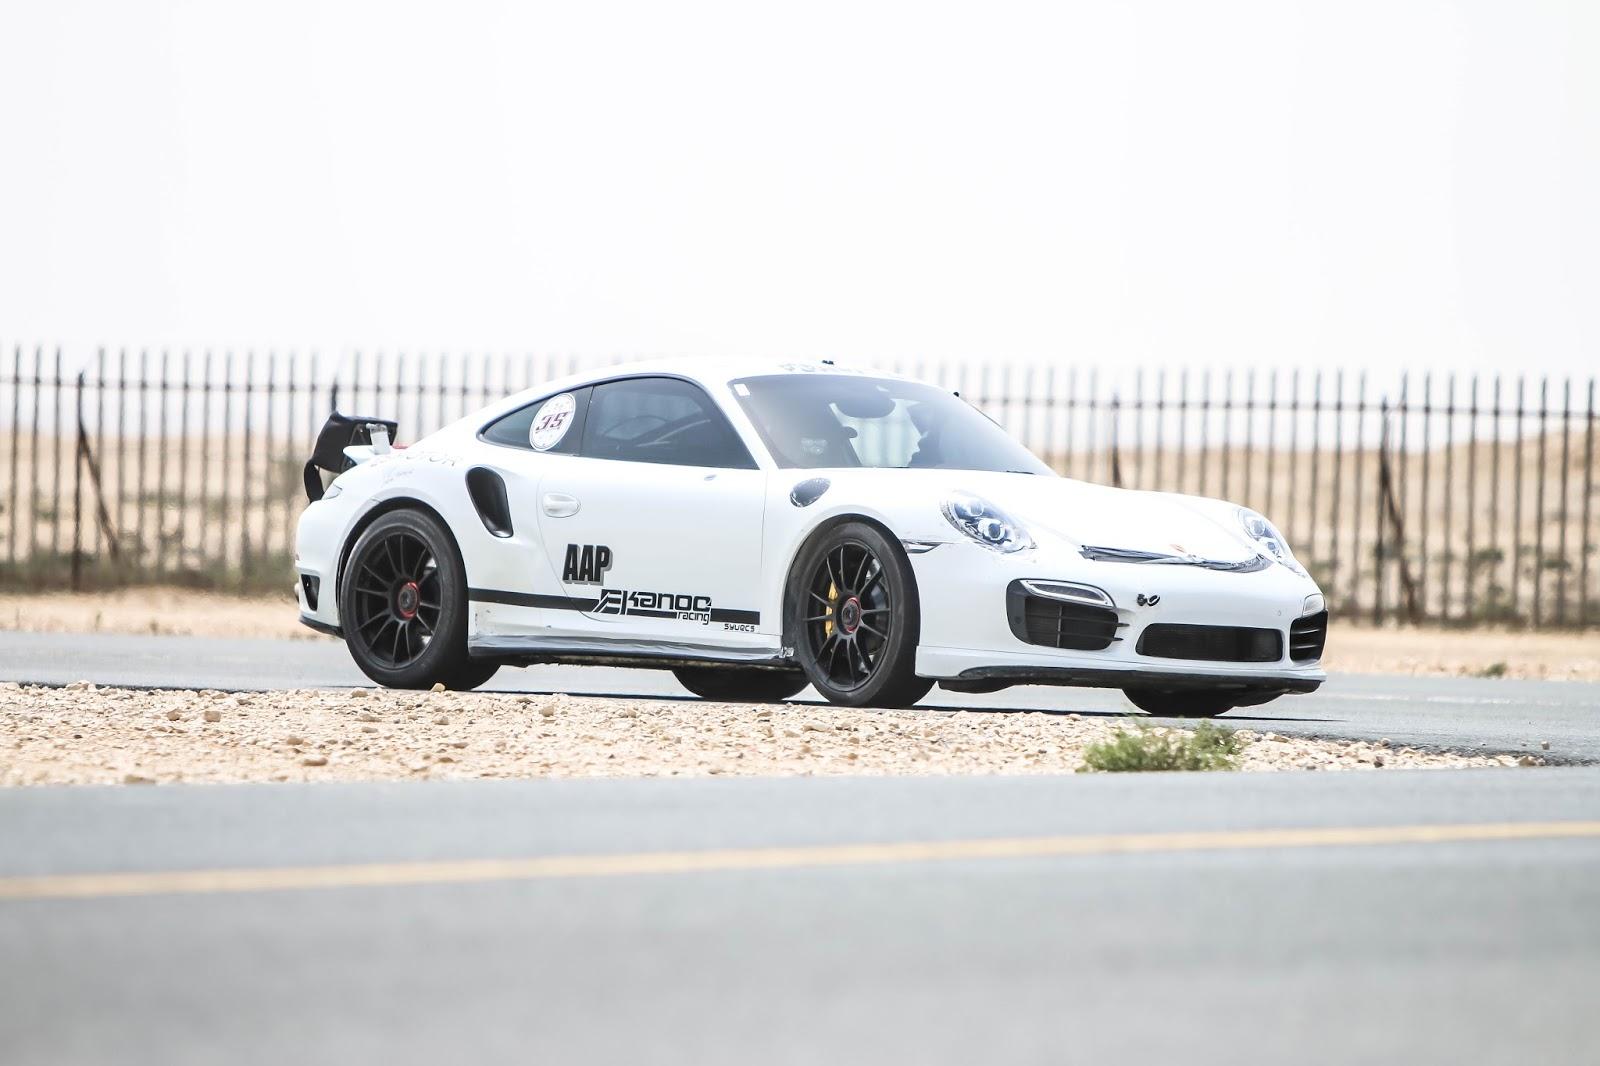 Top 3 Fastest Porsche In The Middle East (Qatar,Dubai,UAE,Kuwait